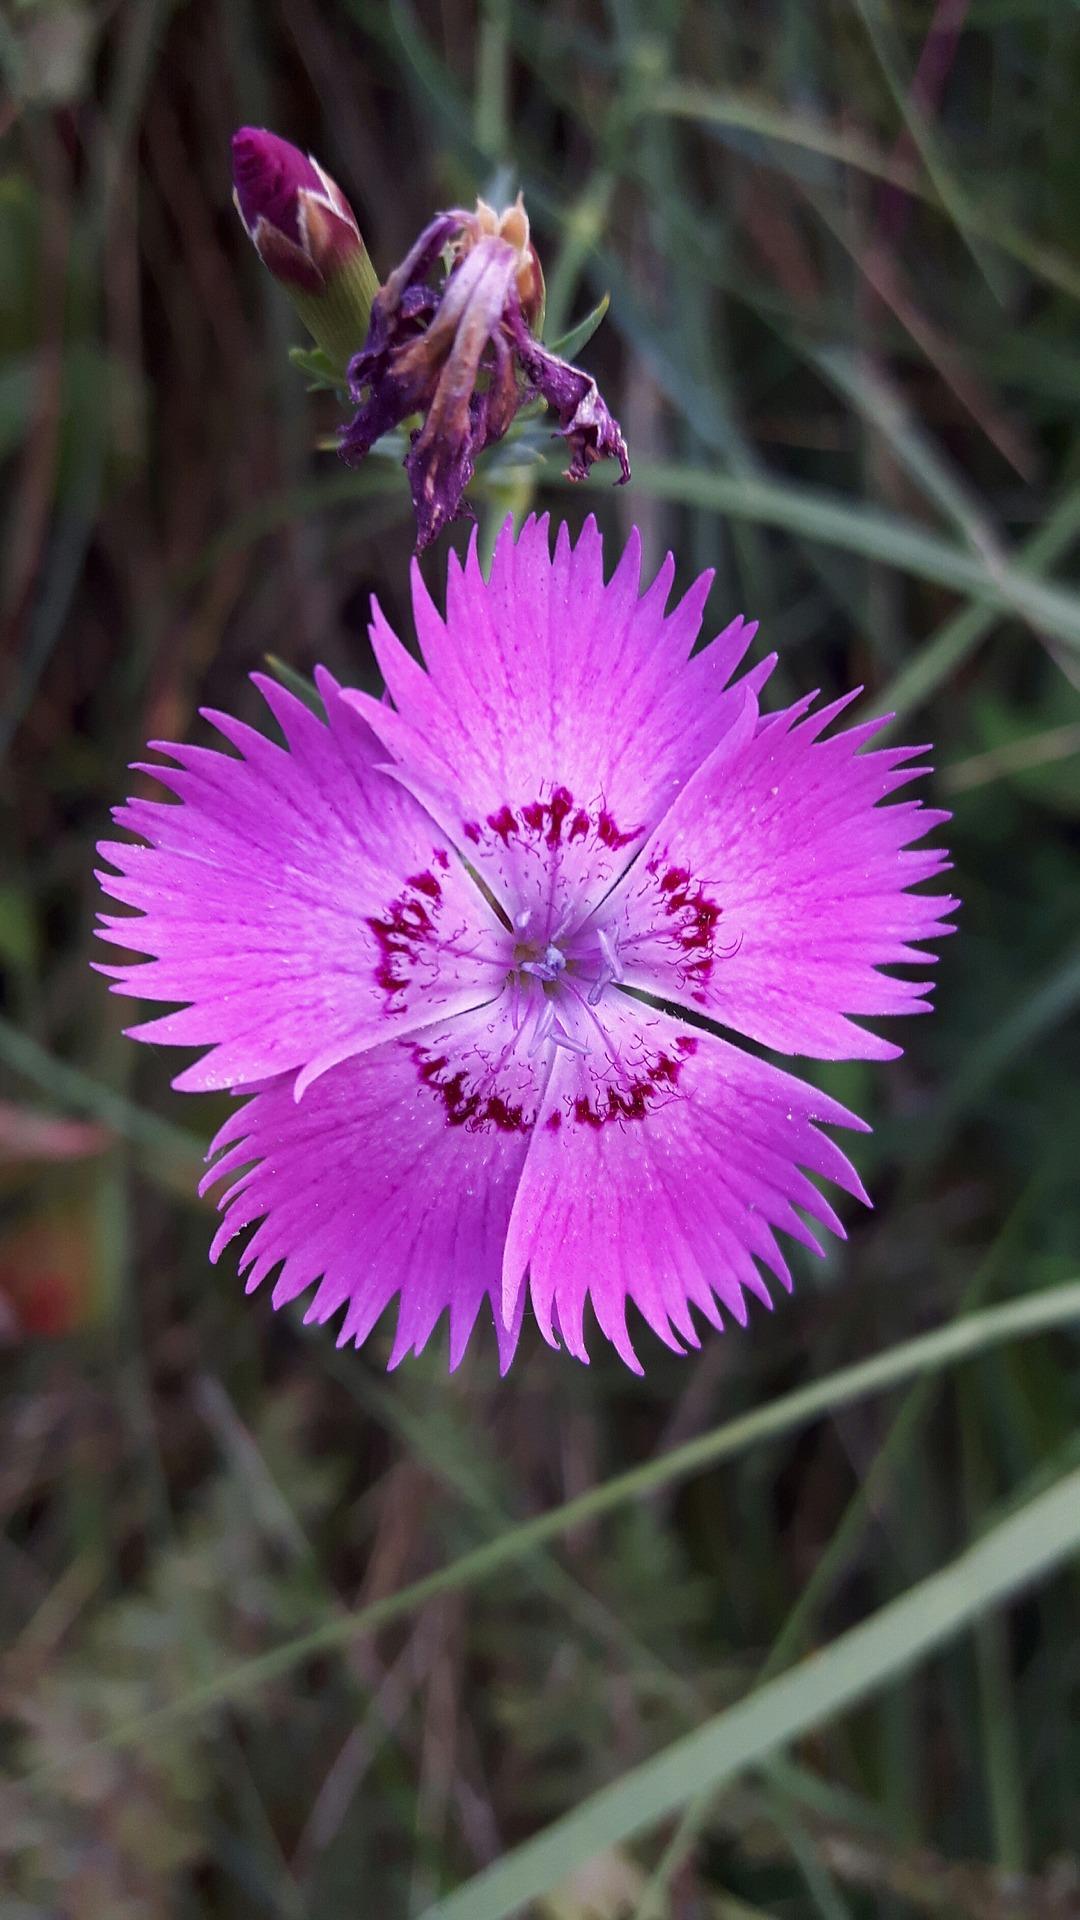 carnation-3397800_1920.jpg